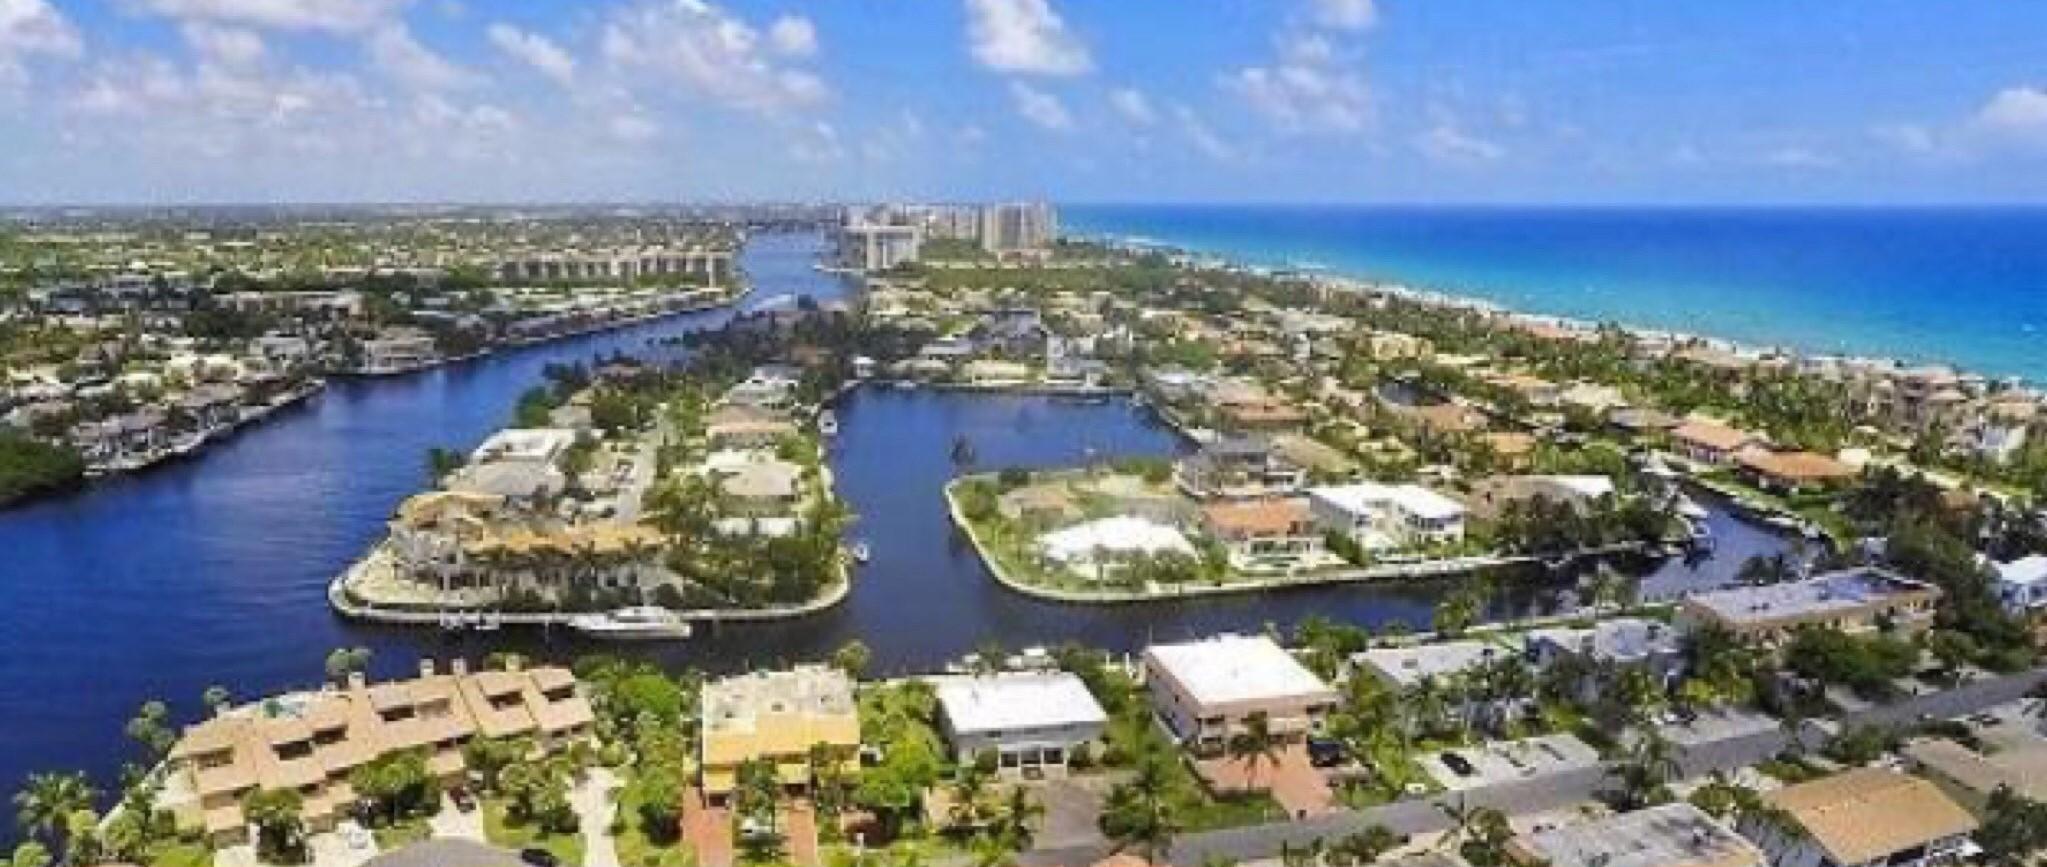 4326 Intracoastal Drive, Highland Beach, Florida 33487, 5 Bedrooms Bedrooms, ,3 BathroomsBathrooms,Single Family,For Sale,Bel Lido,Intracoastal,1,RX-10445728